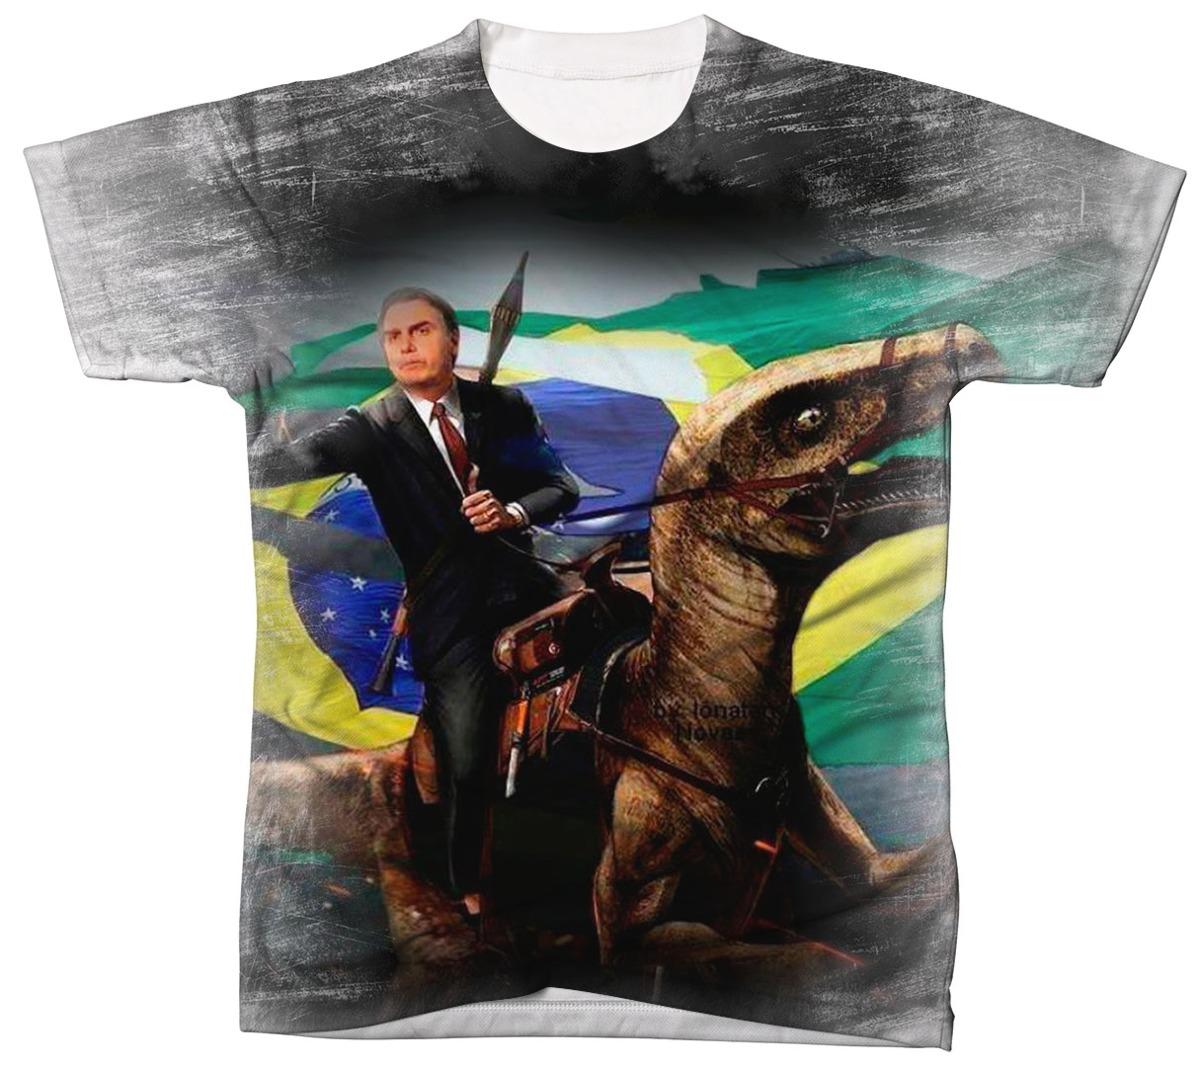 Camisa Camiseta Jair Bolsonaro Mito Presidente Direita 20 - R  40 0a057d458d5a6